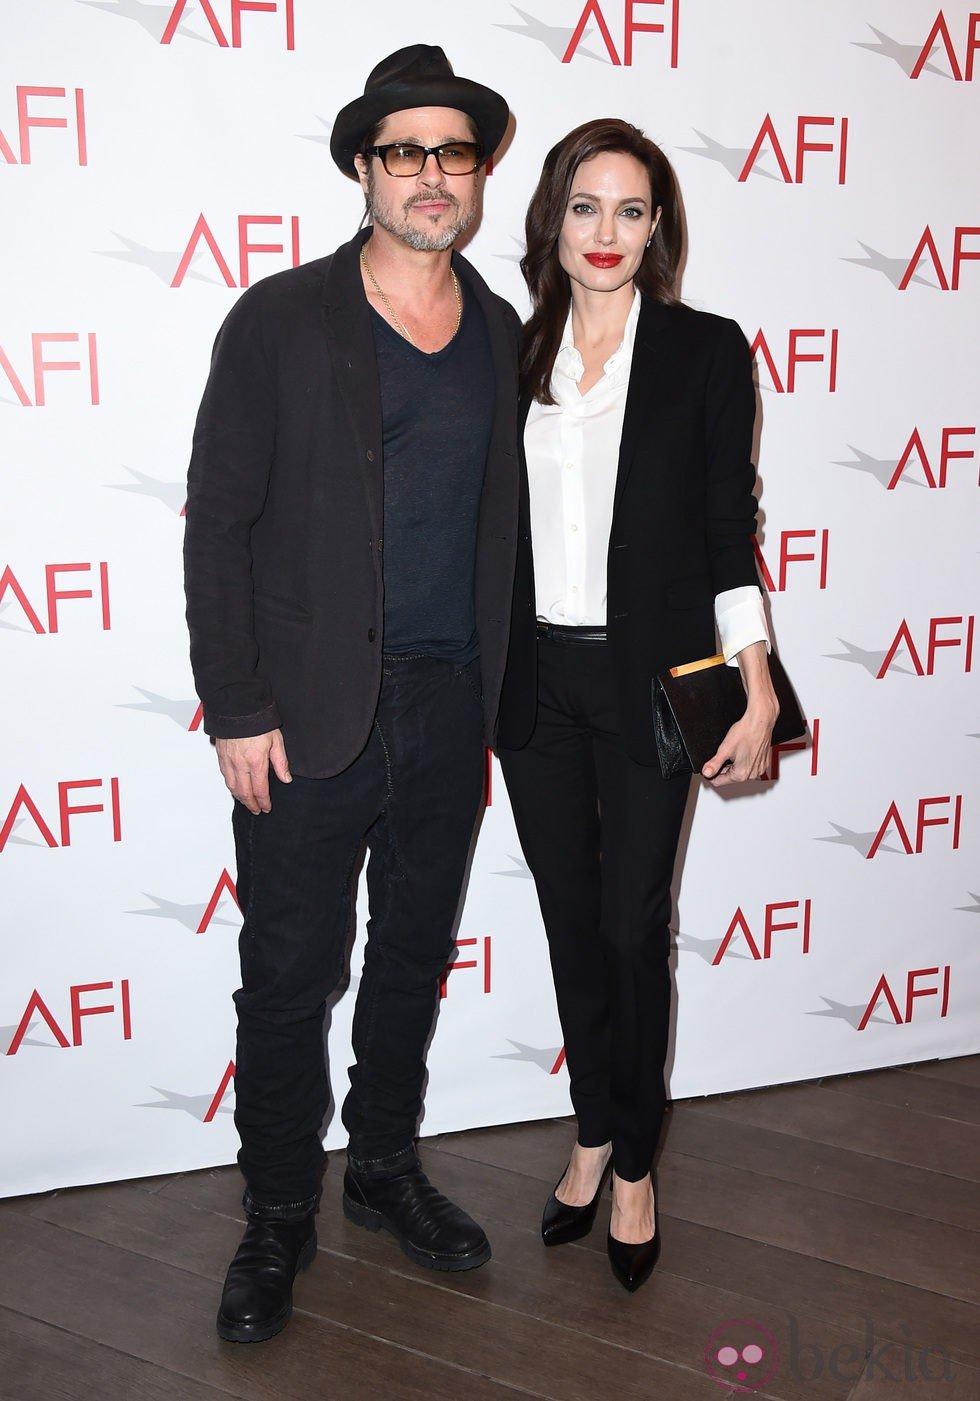 Brad Pitt y Angelina Jolie en los AFI Awards 2014